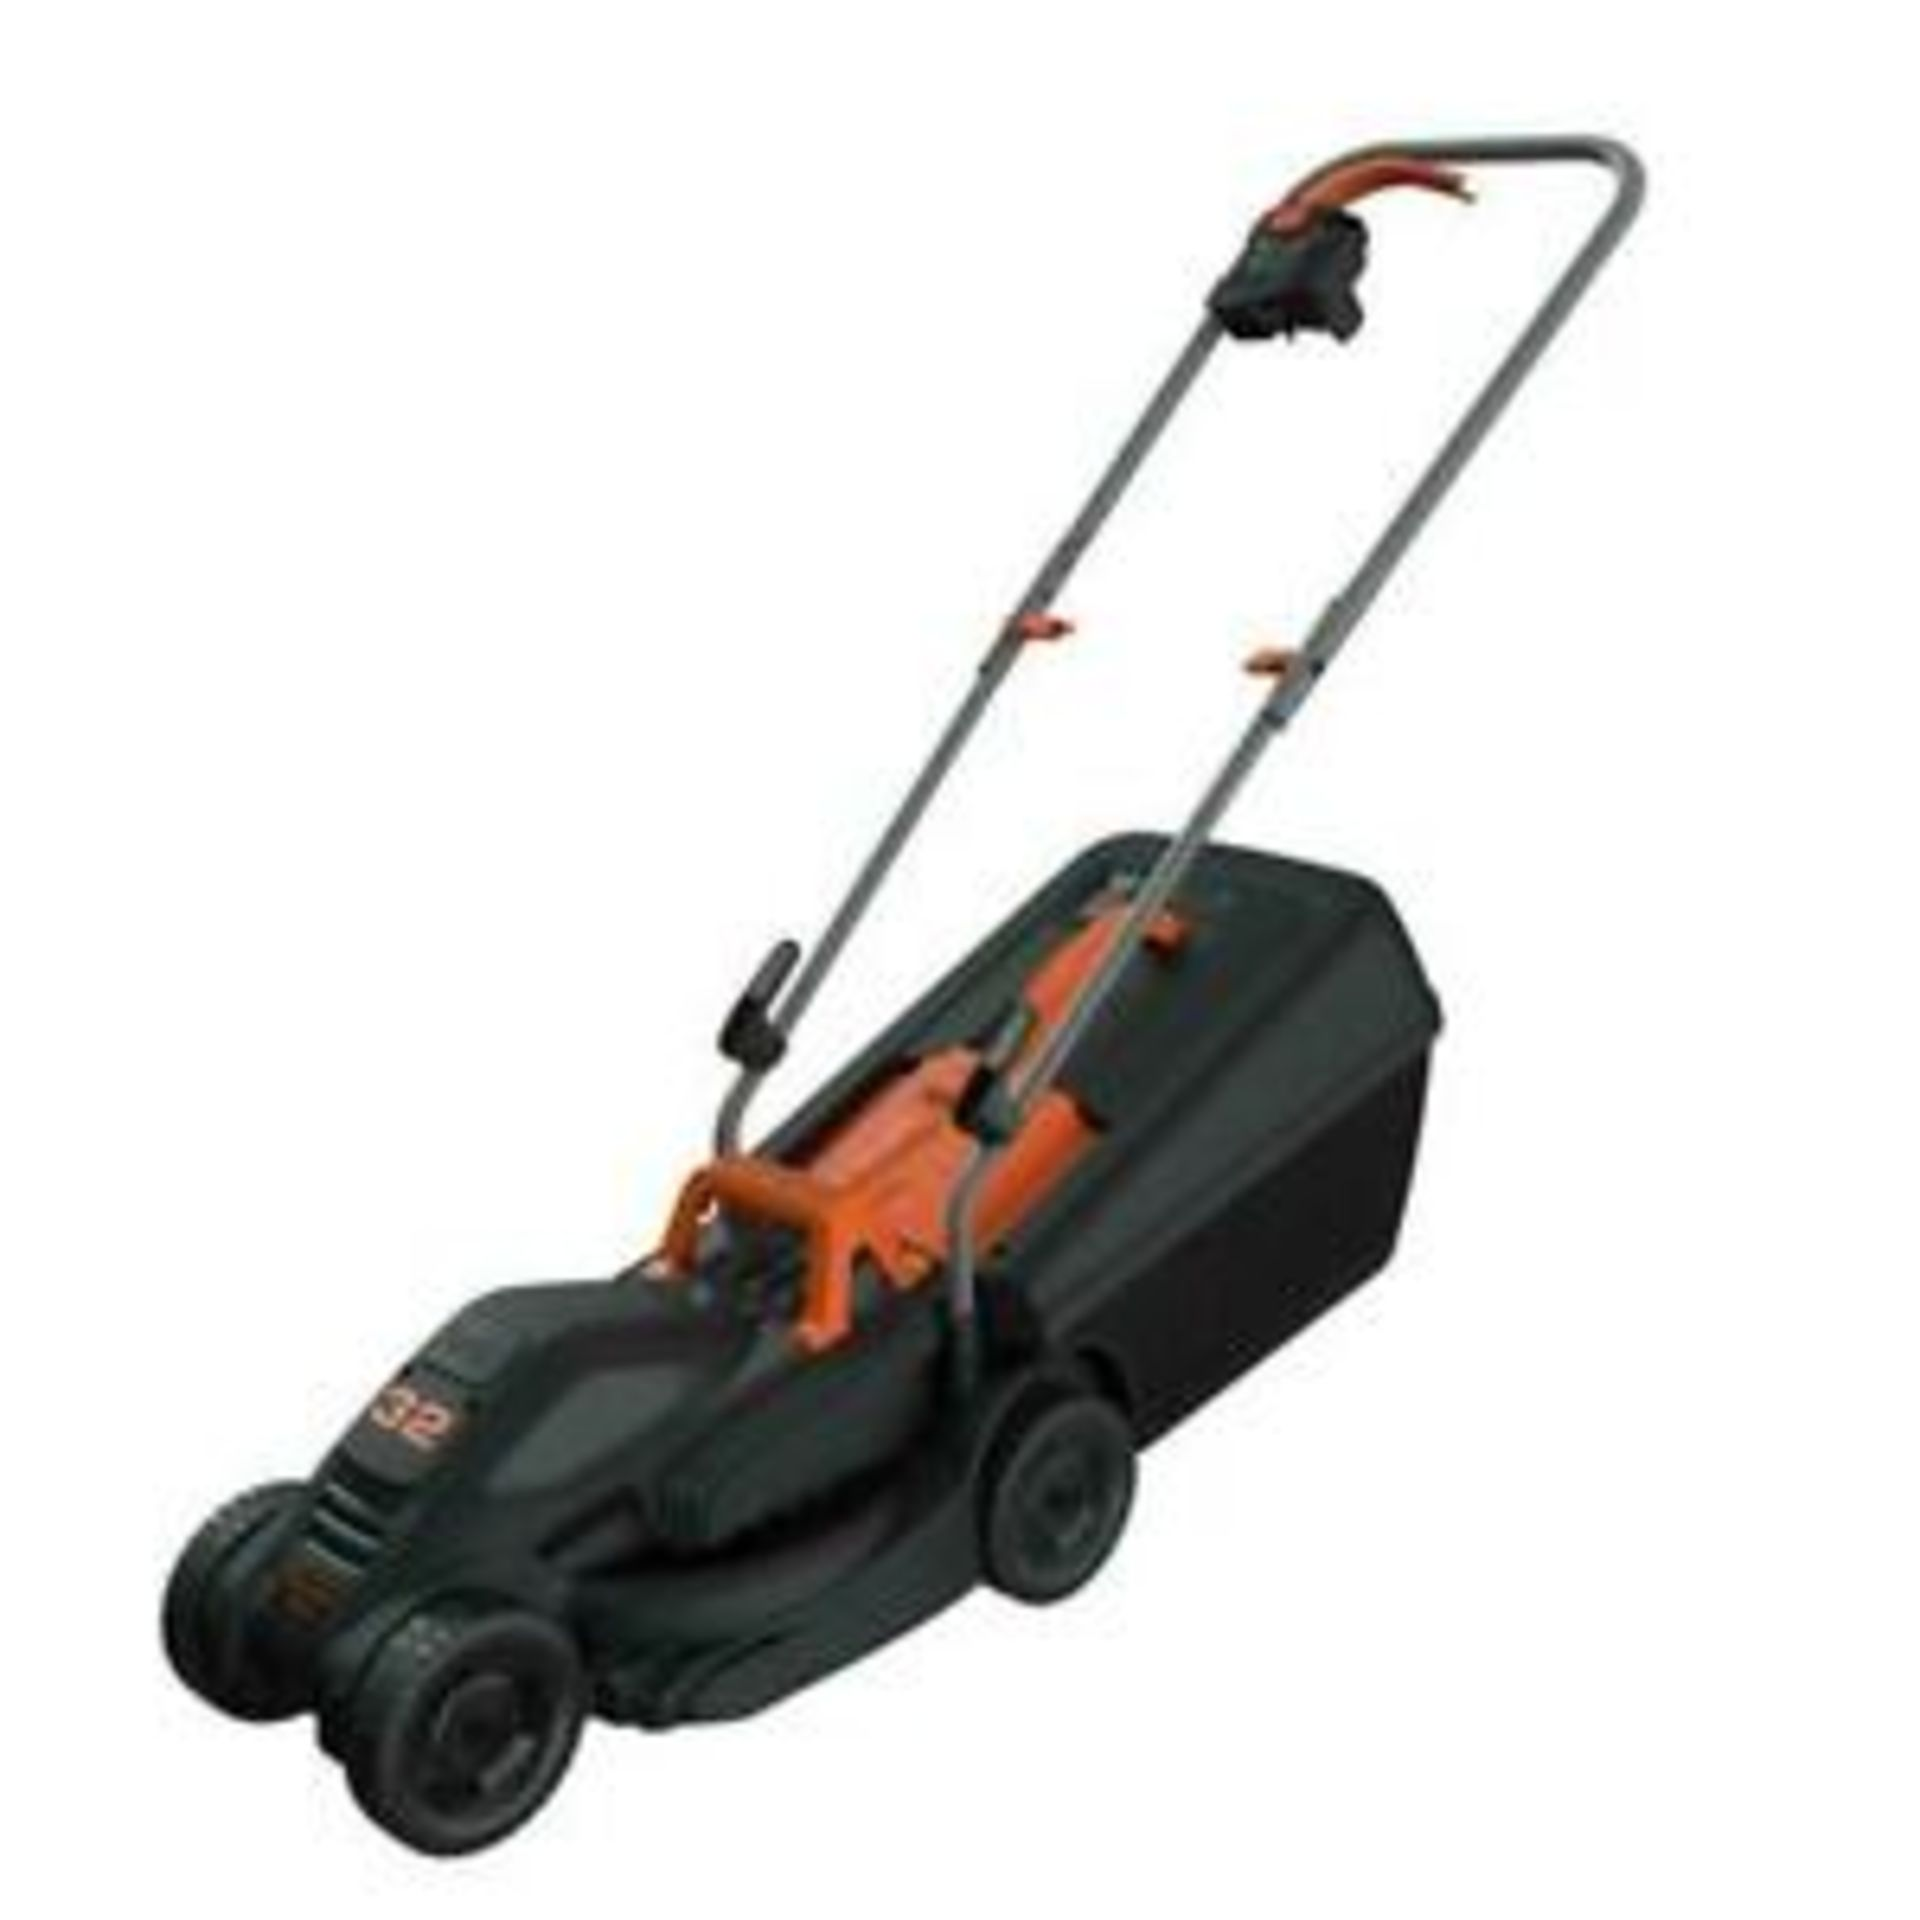 (P5) 1x Black & Decker 32cm 1000W Corded Lawn Mower. Contents Appear Clean, Unused. (Please Note –